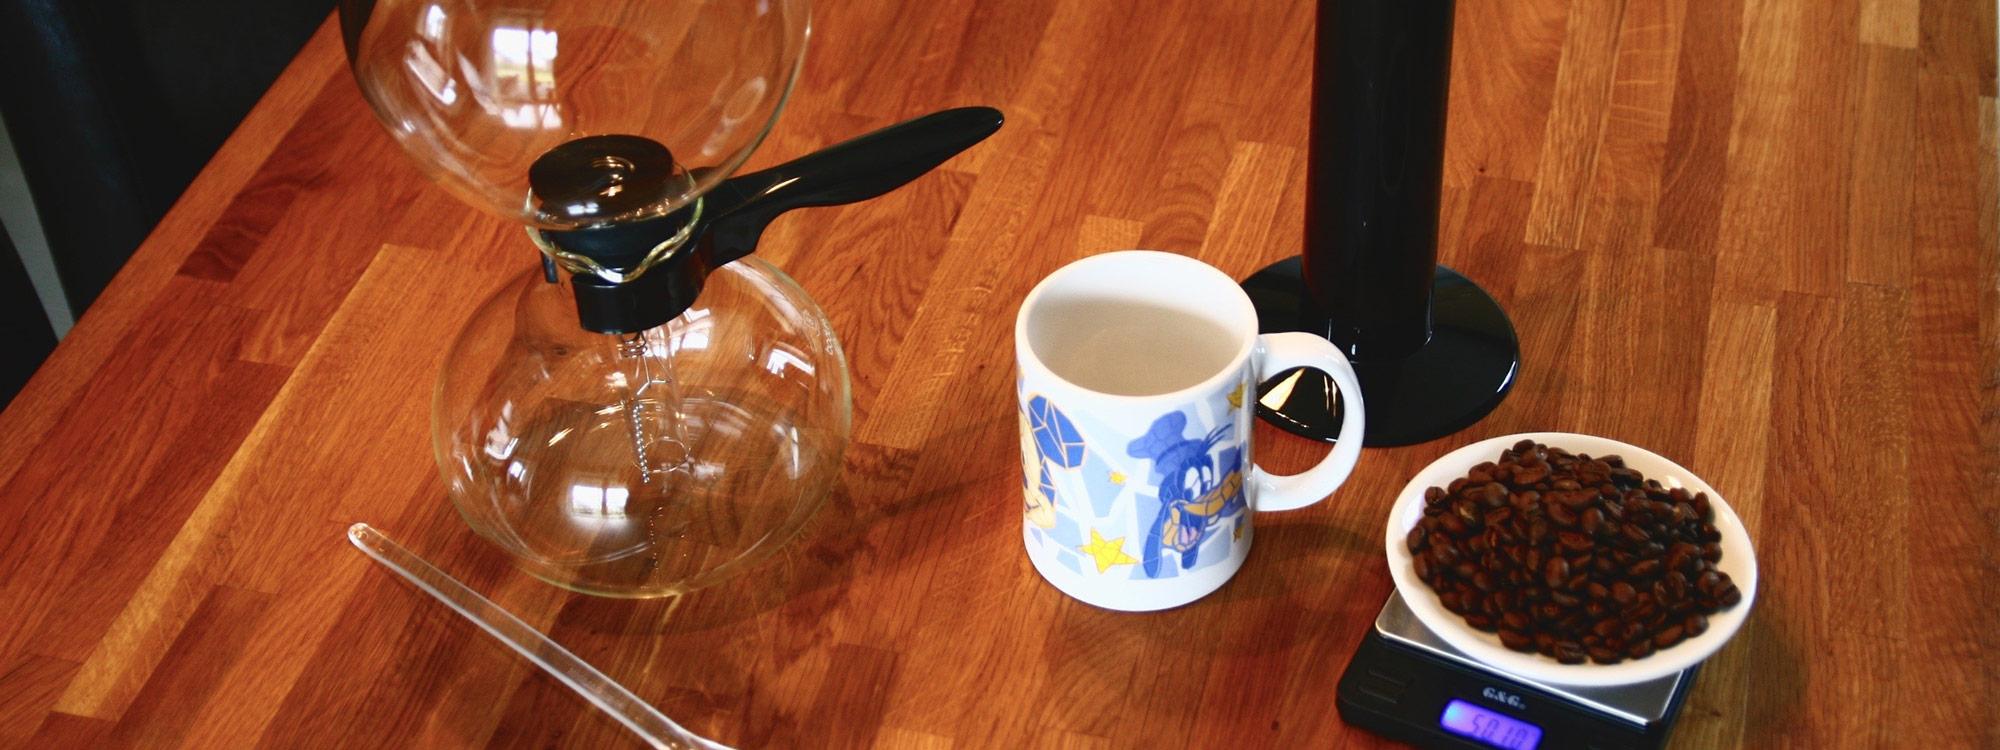 Brewing Methods: The Vacuum Coffee Maker